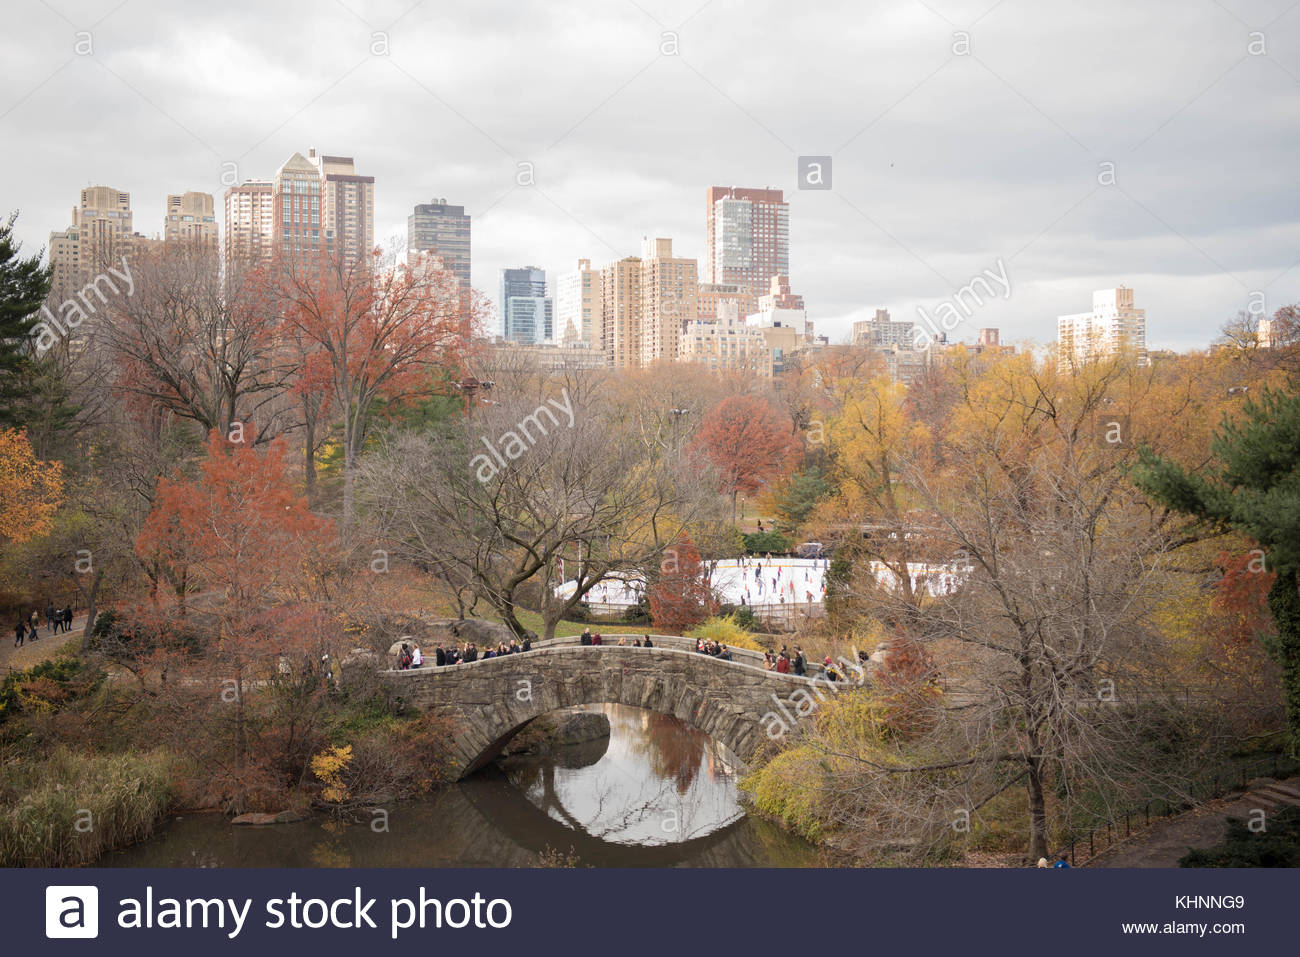 The Gapstow Bridge in Central Park, Manhattan, New York, USA - Stock Image